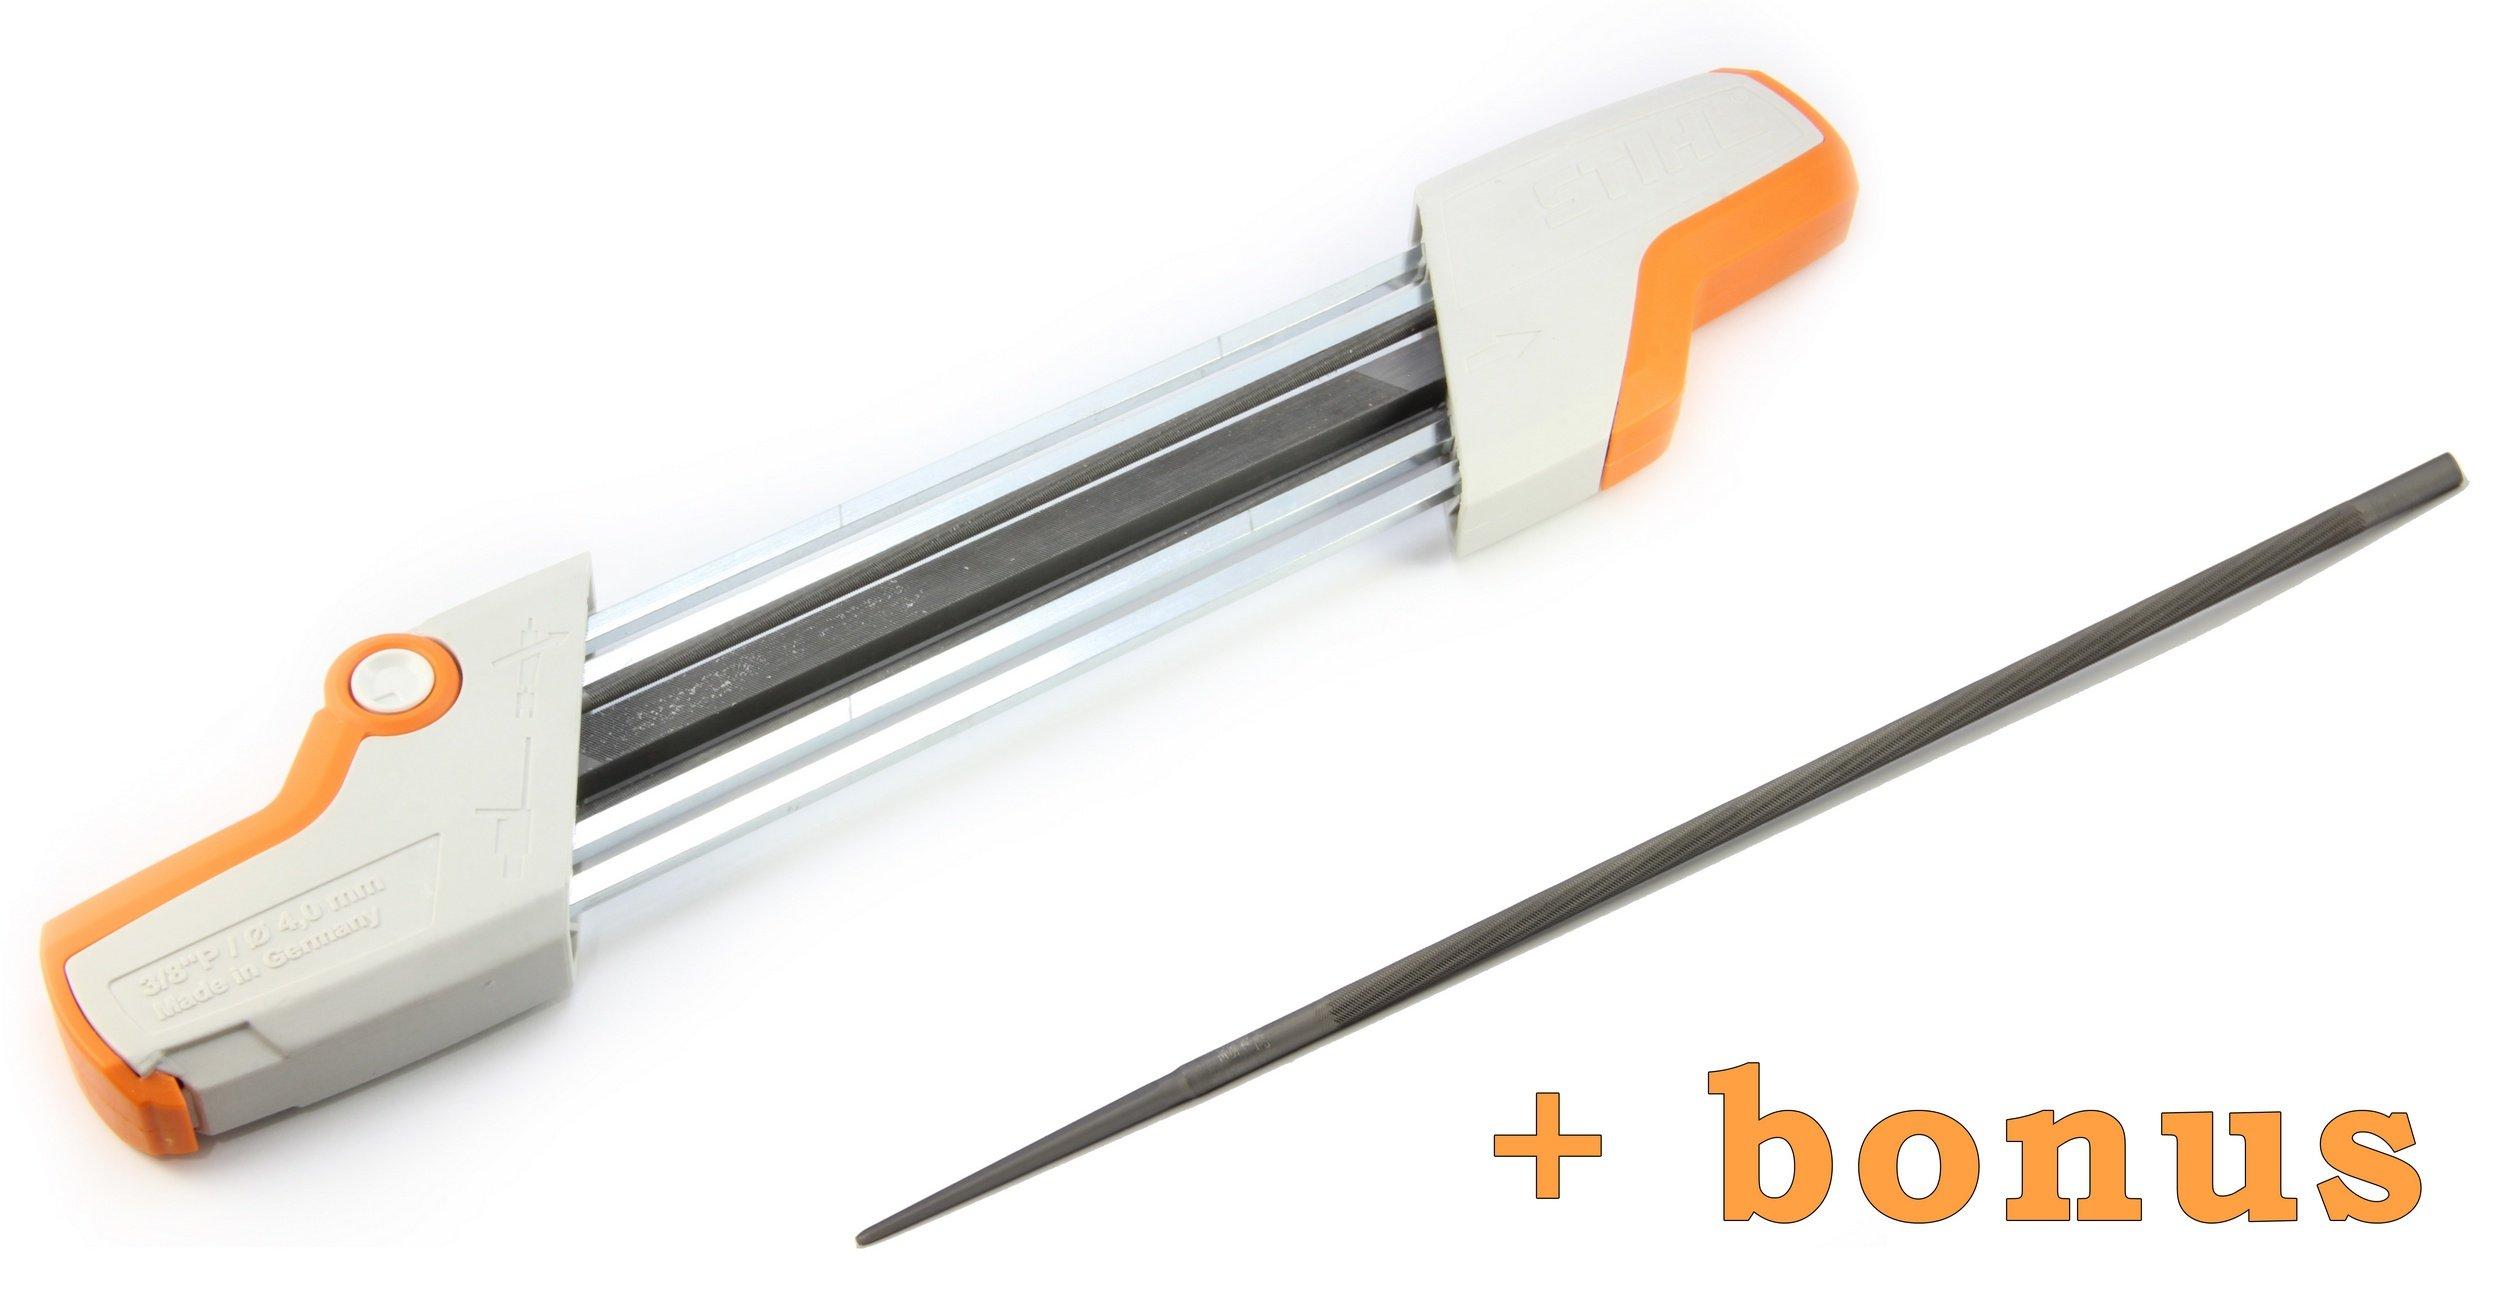 Stihl 2 in 1 Easy File Chainsaw Chain Sharpener Kit, 3/8 P 4.0 mm + Bonus Replacement File!